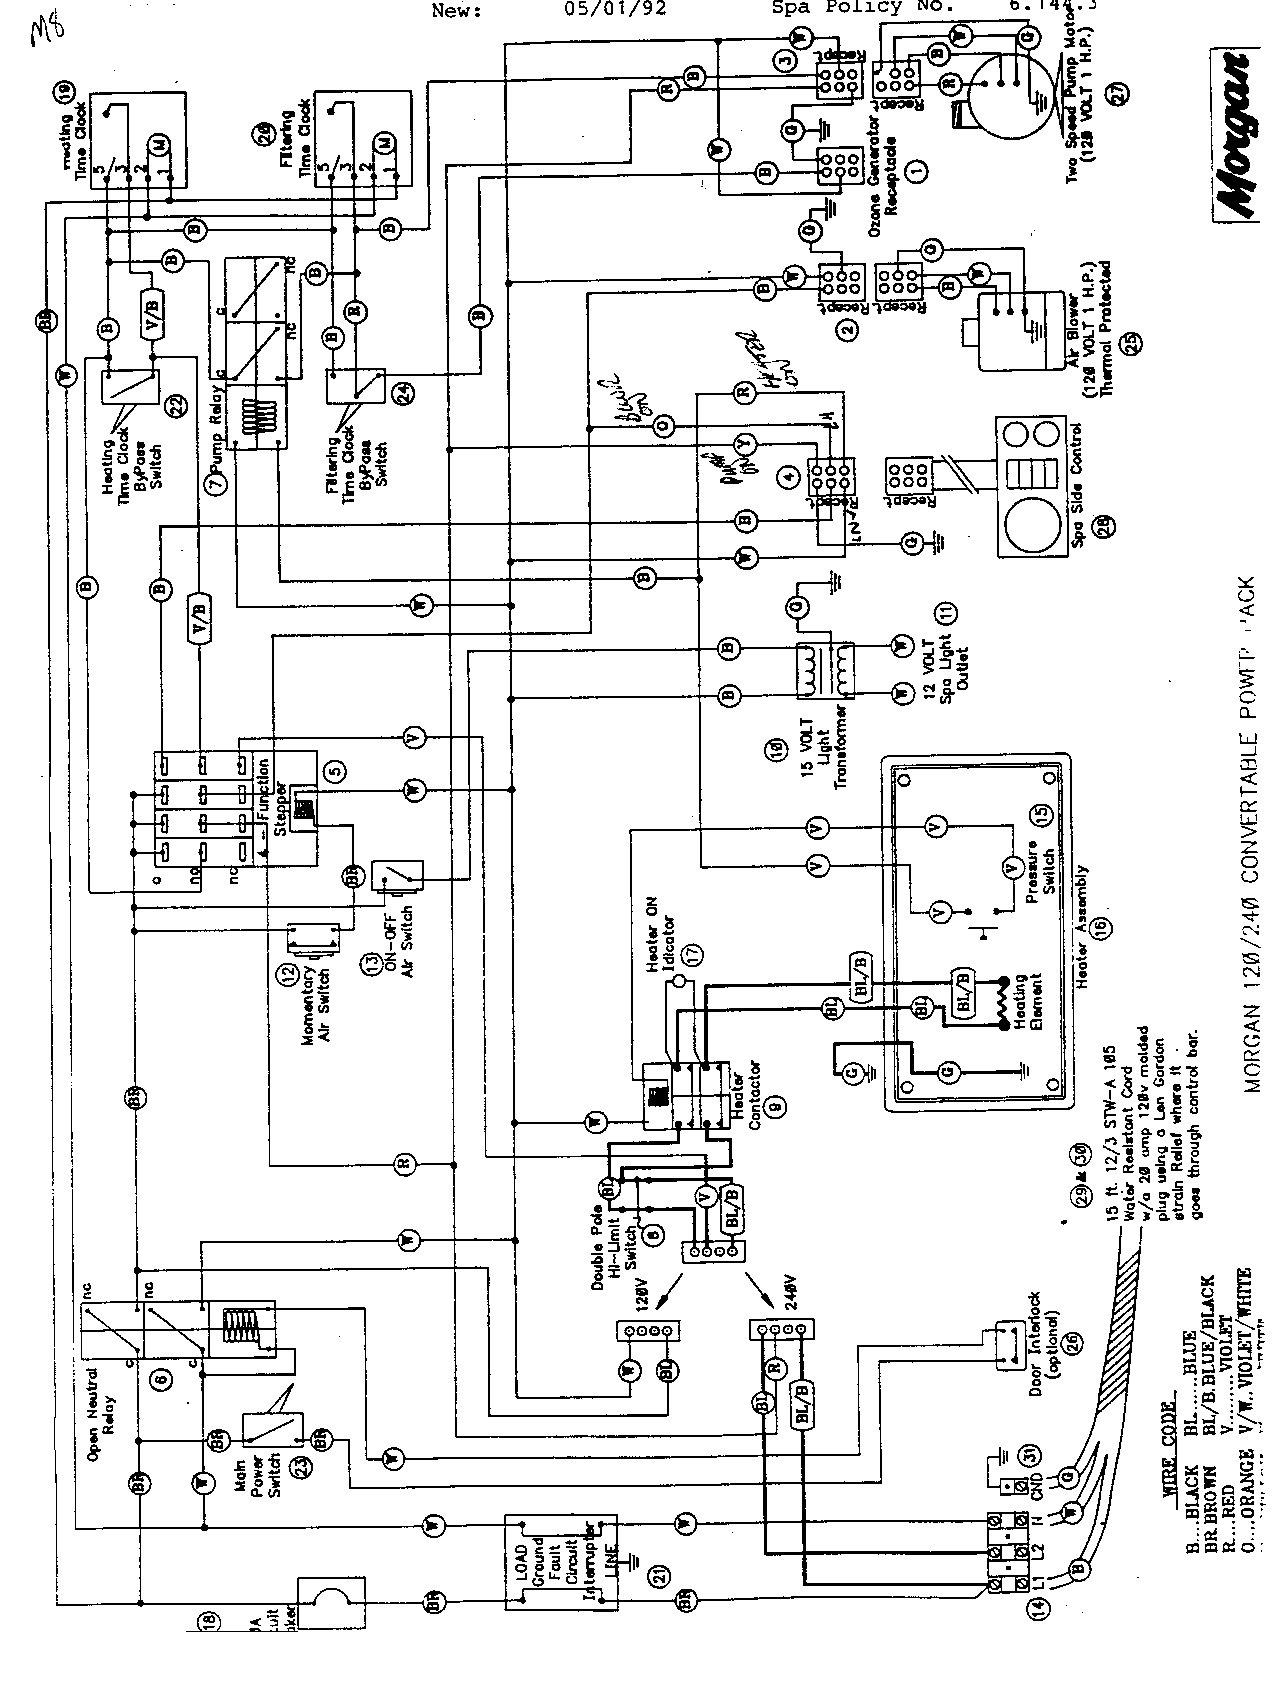 hot springs hot tub wiring diagram Download-Hot Spring Spa Wiring Diagram Inspirational Wiring Diagram for Hot Tub Free Download Wiring Diagram 8-t